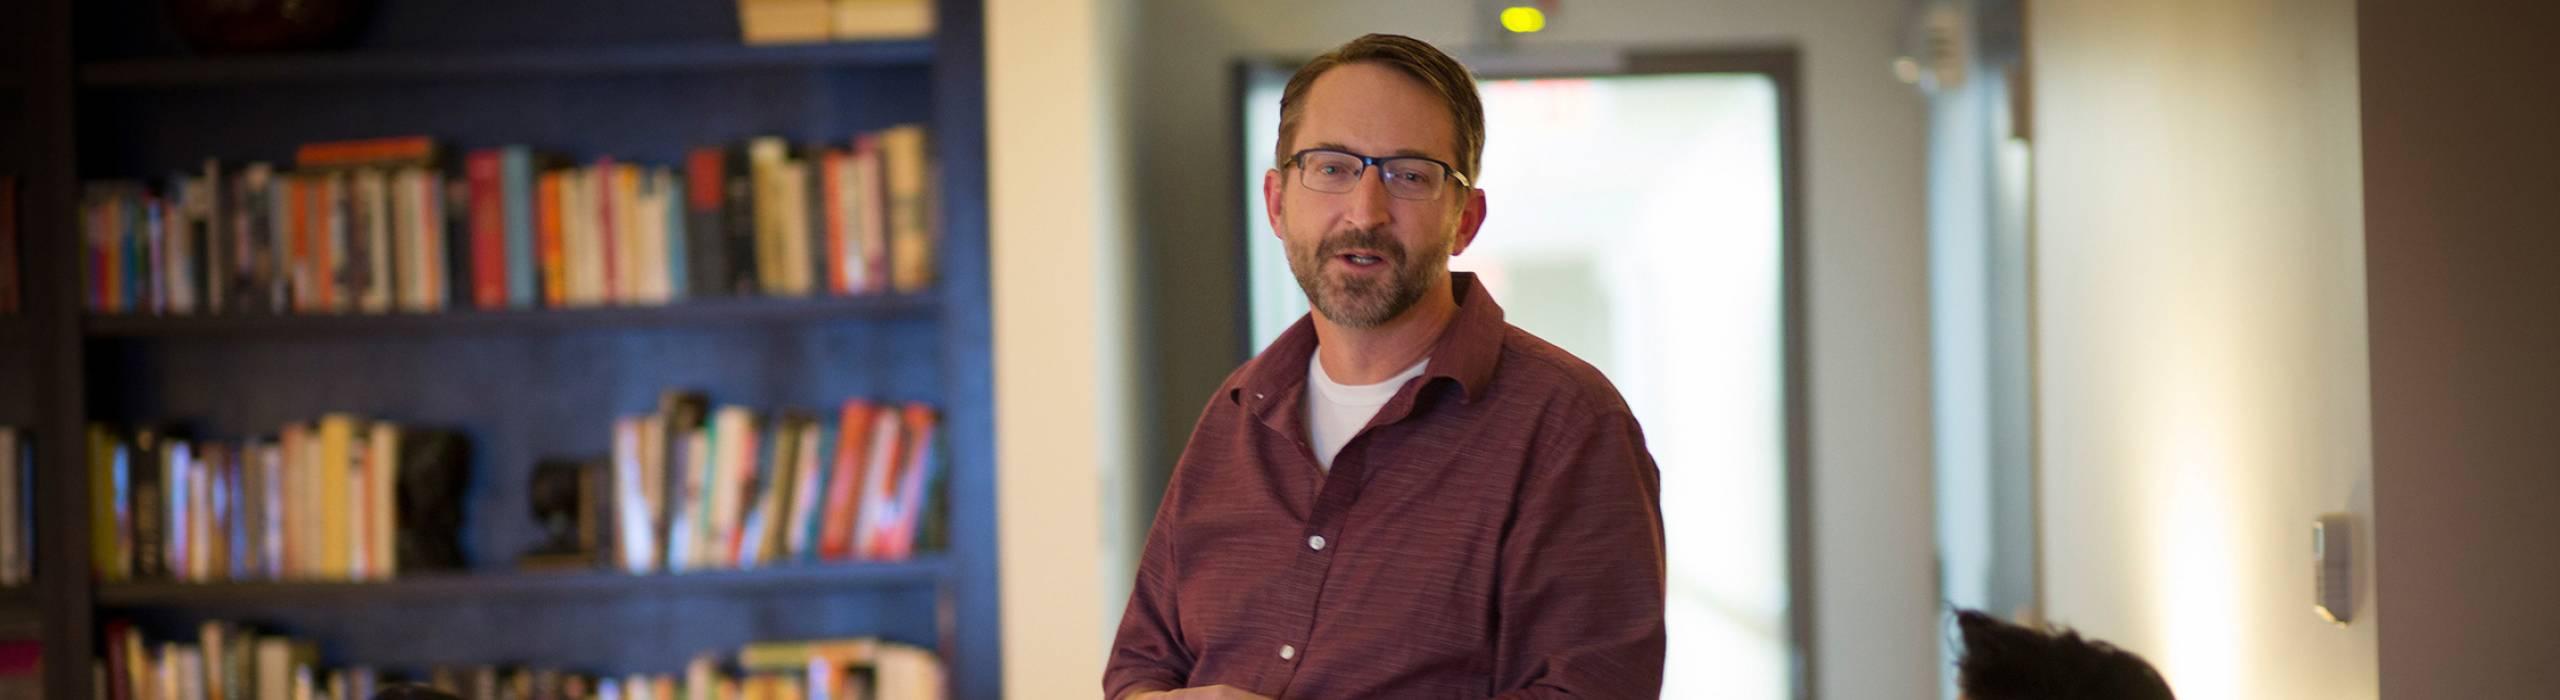 Information Science Associate Professor and Department Chair Steve Jackson